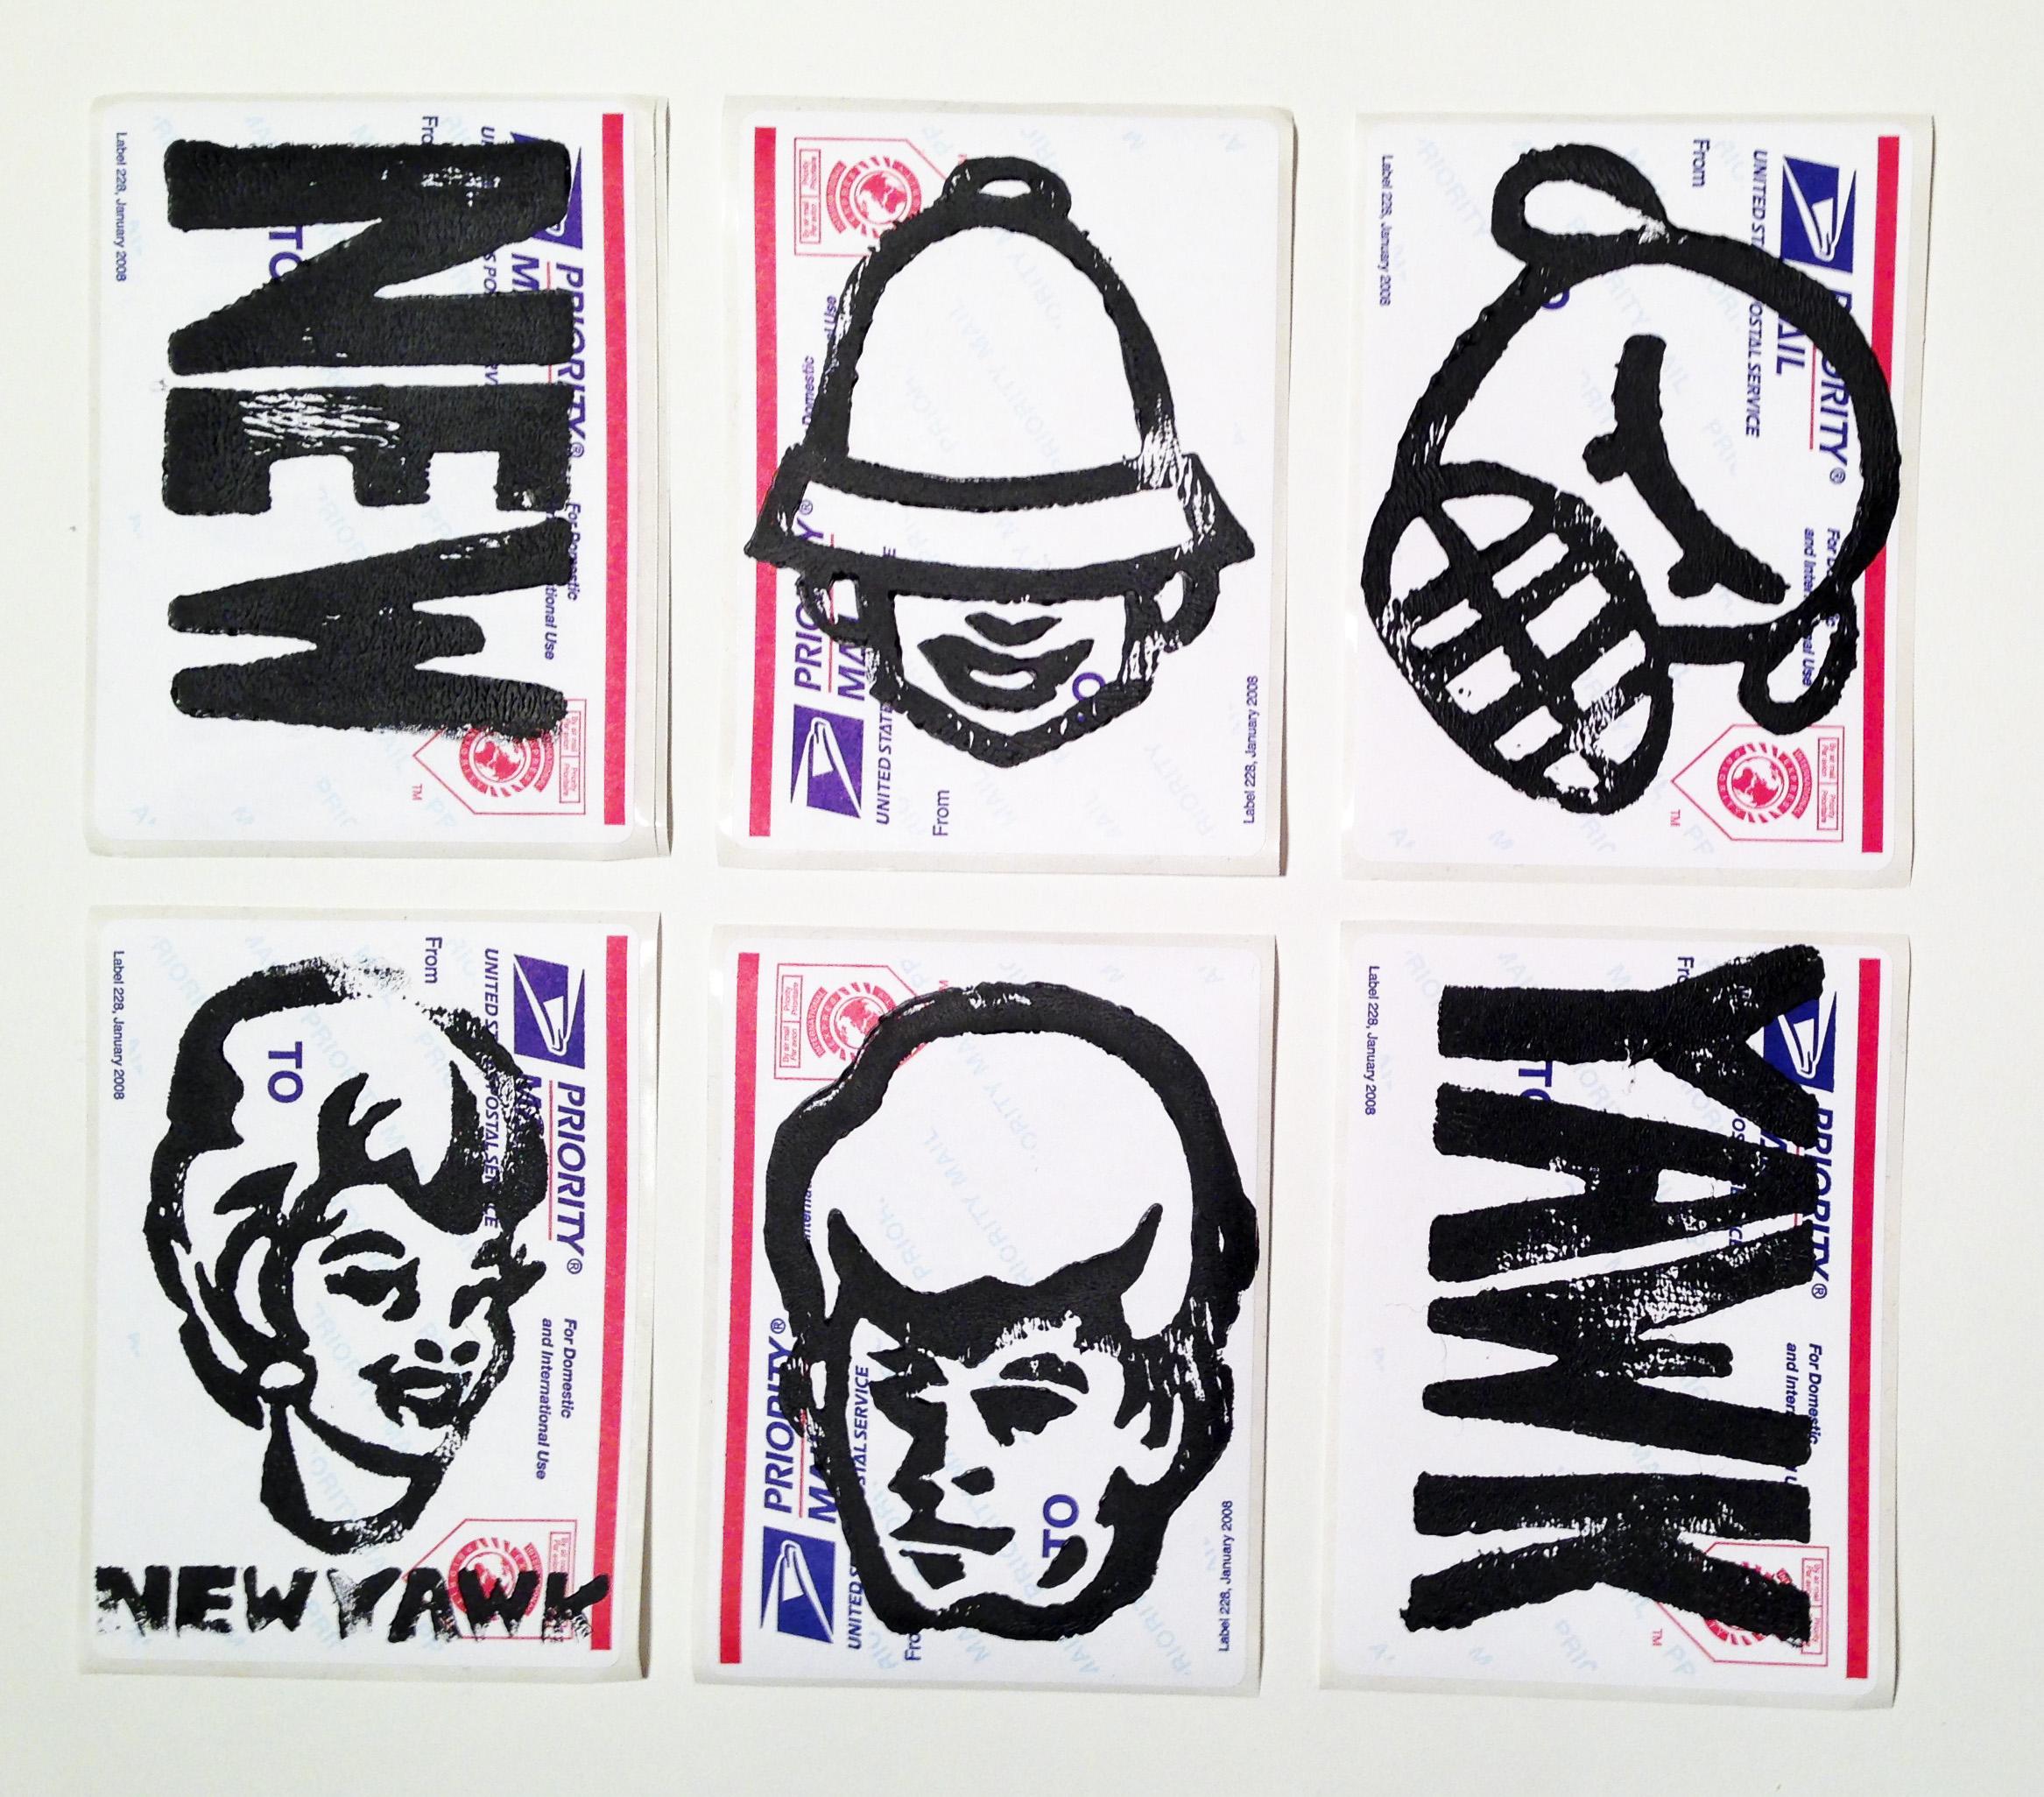 NEWYAWK Sticker pack